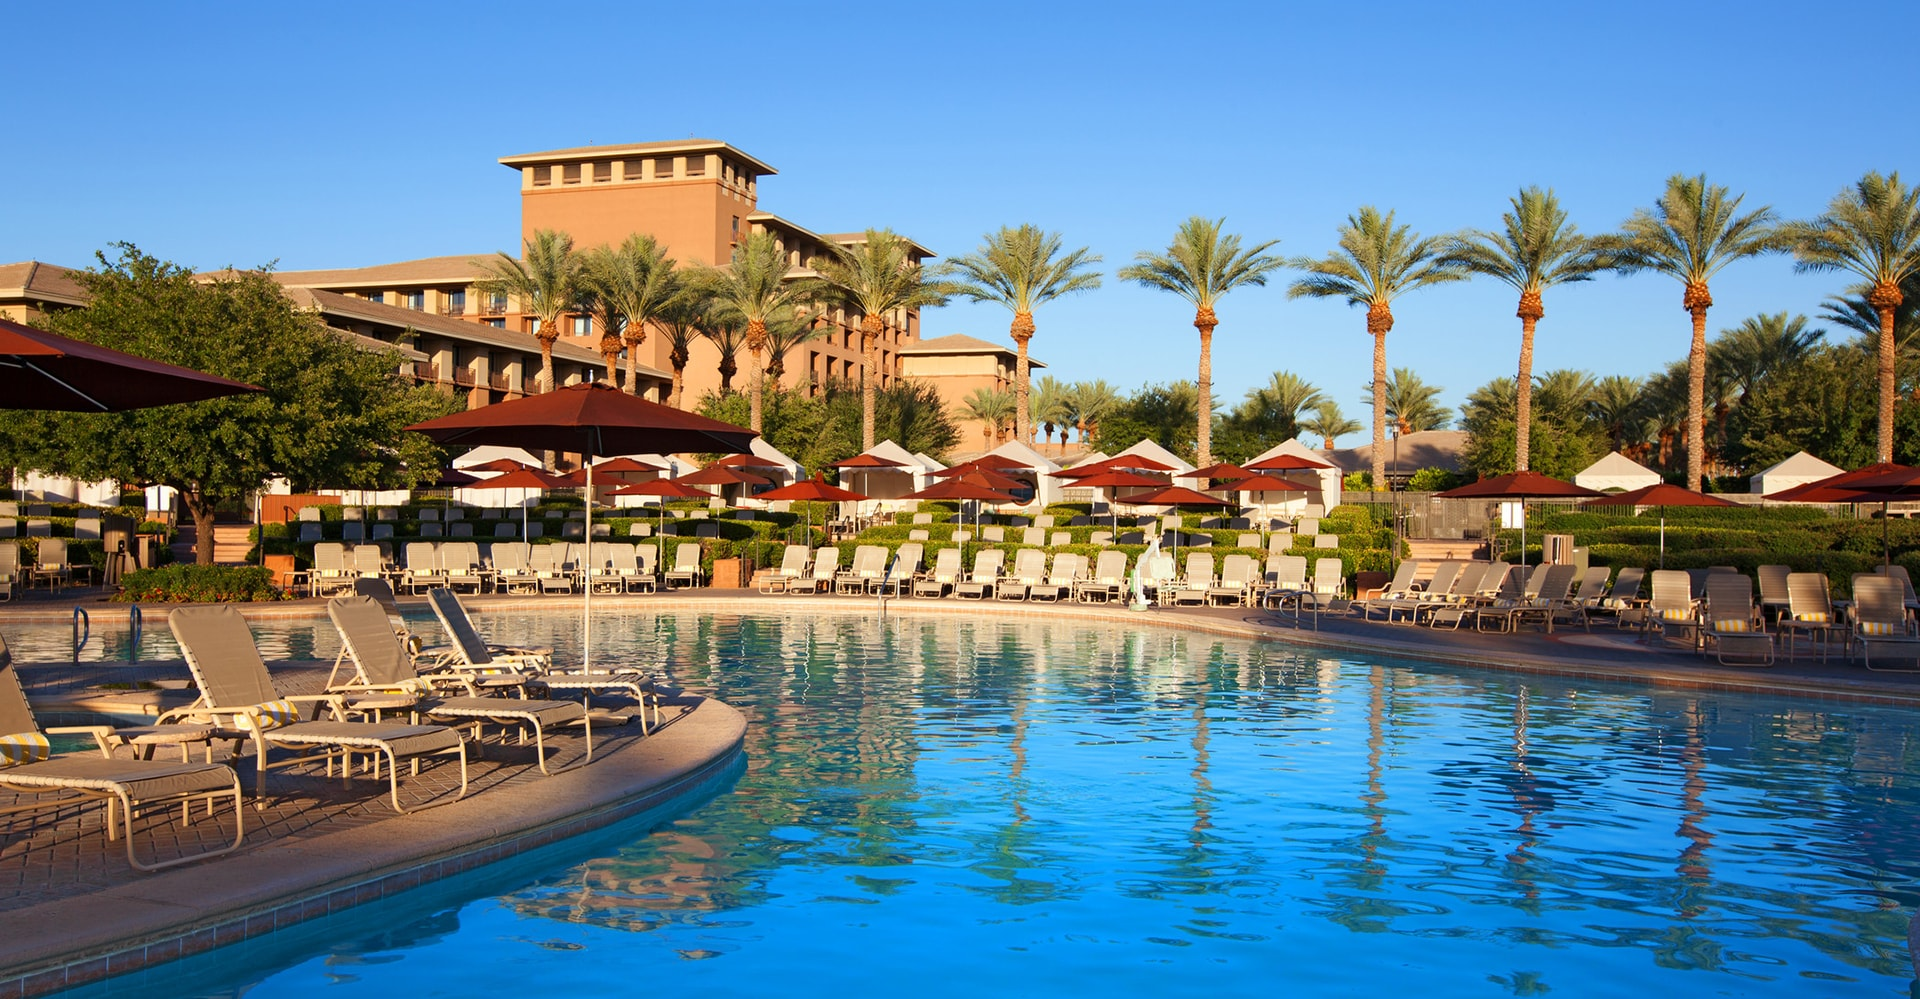 Kierland Westin Resort Pool In Scottsdale Arizona